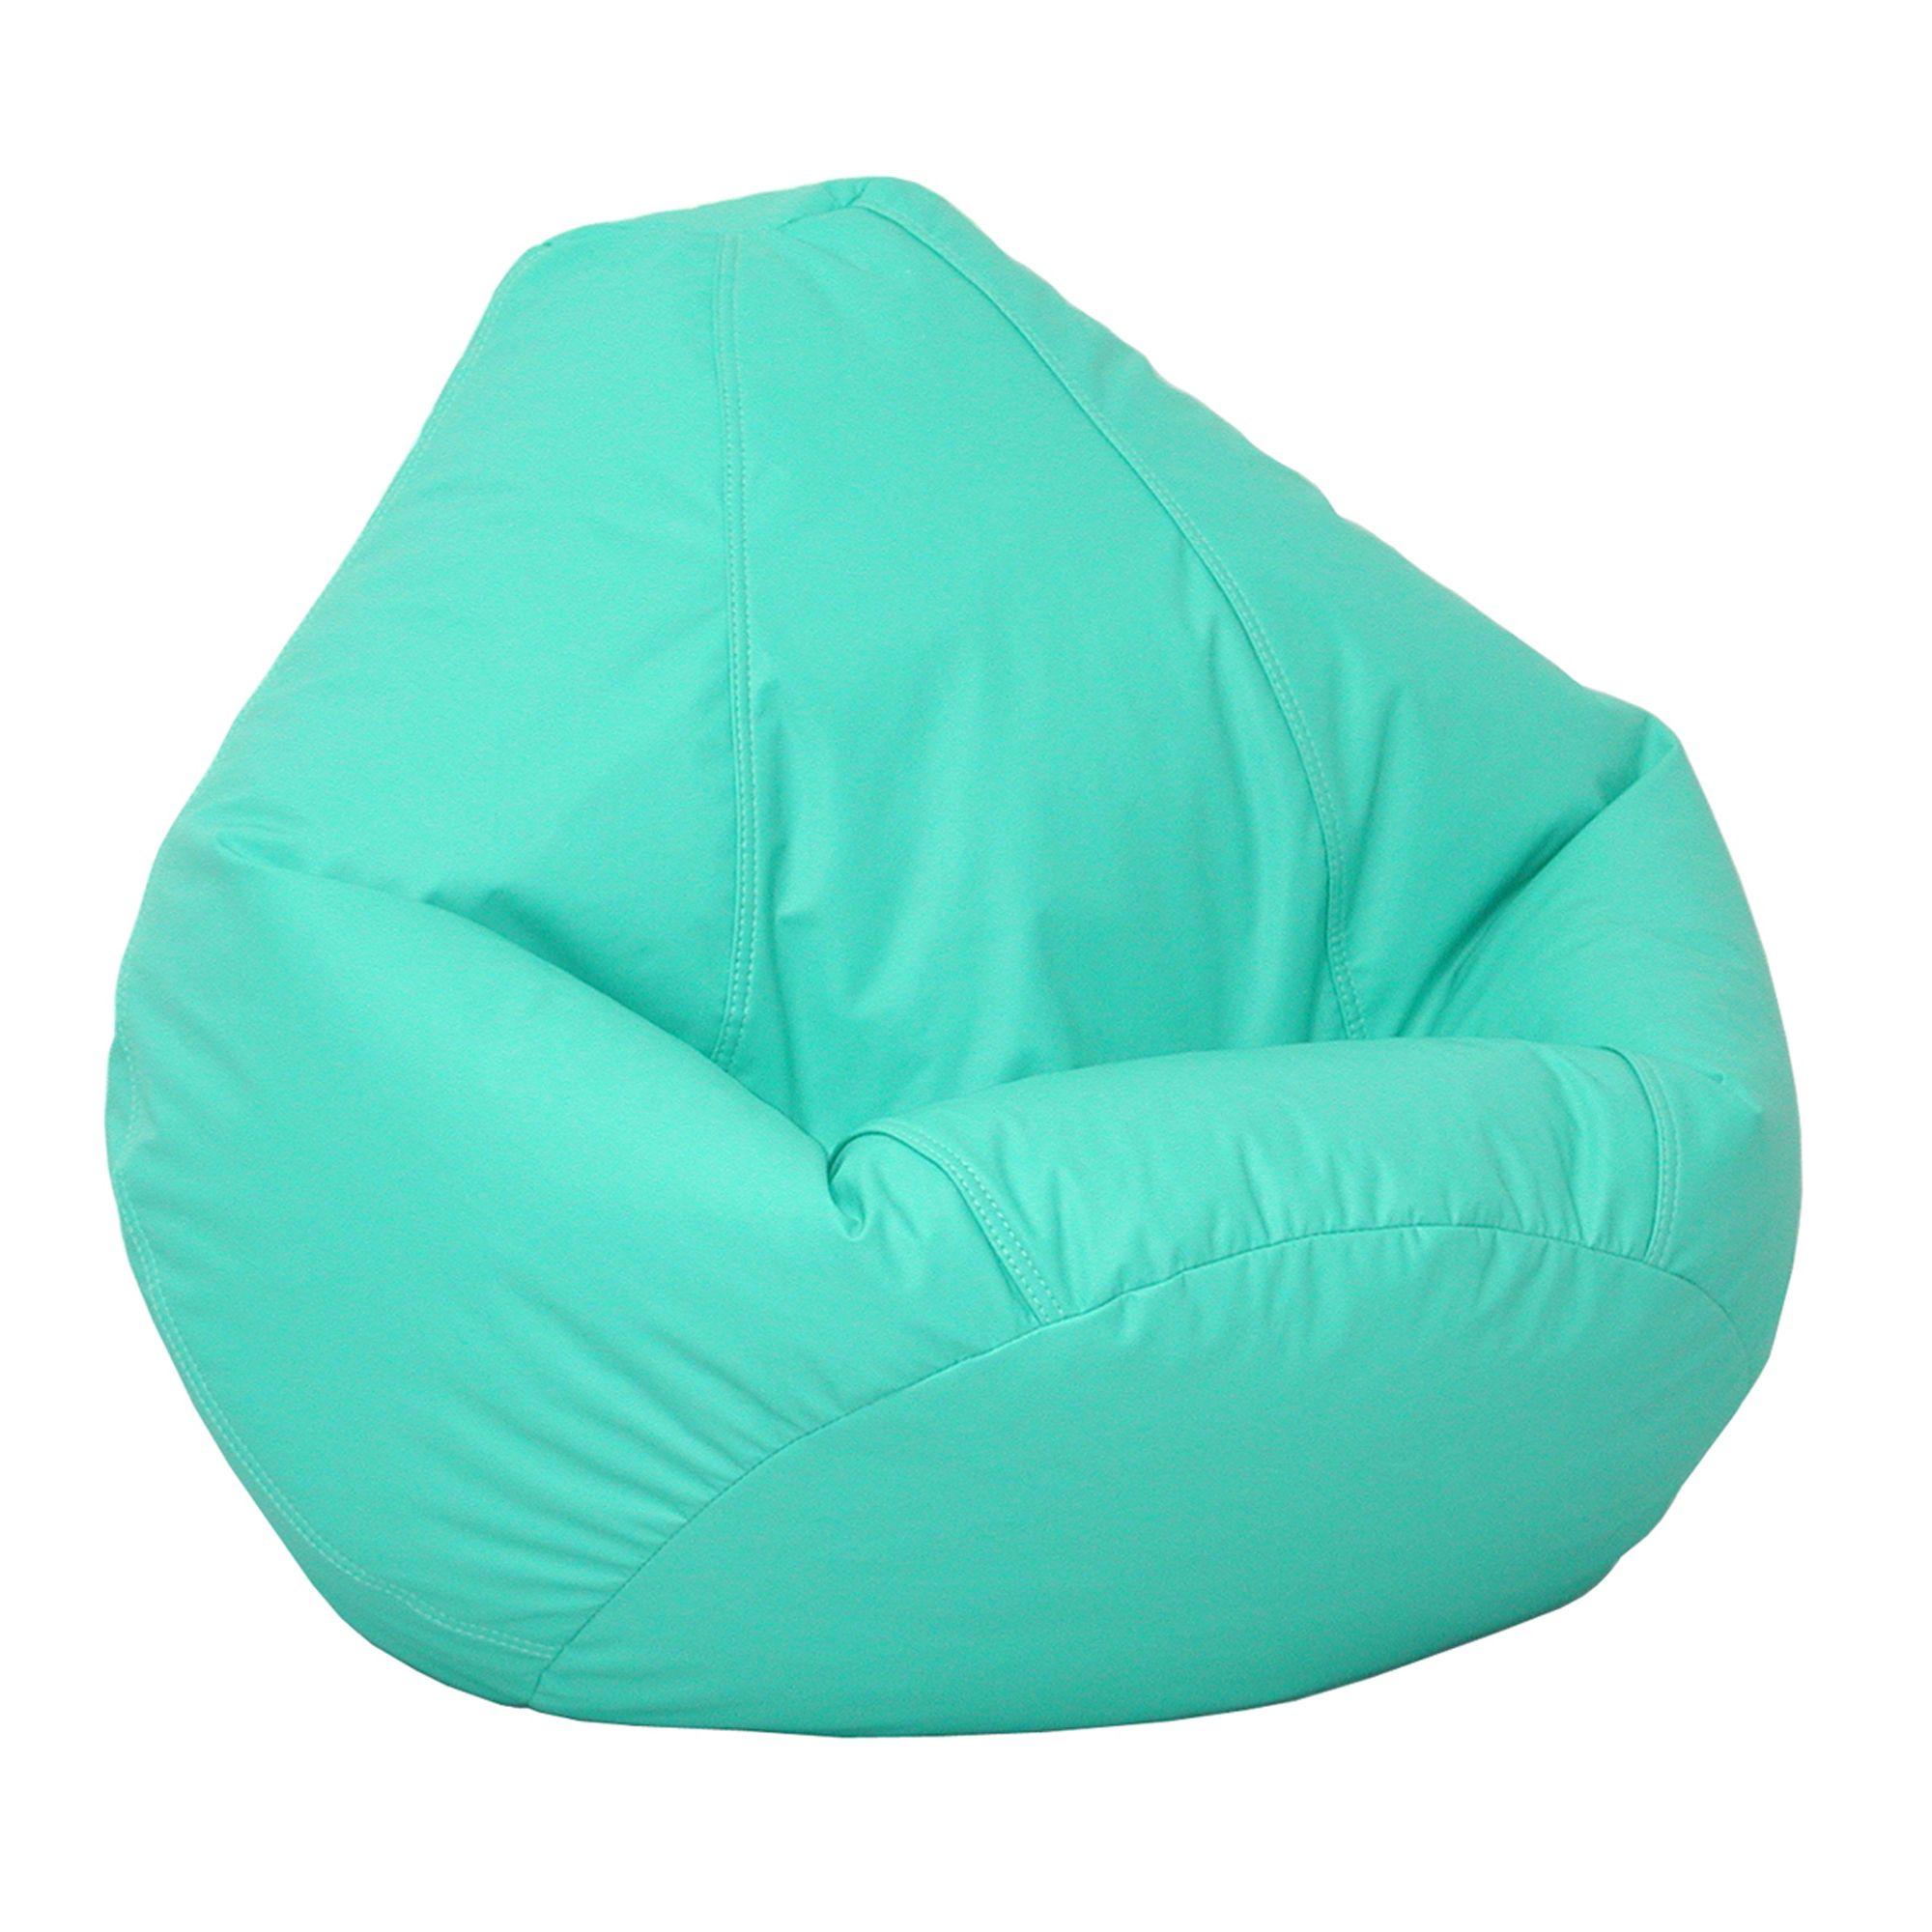 American Furniture Alliance Large Lifestyle Bean Bag - Aqua